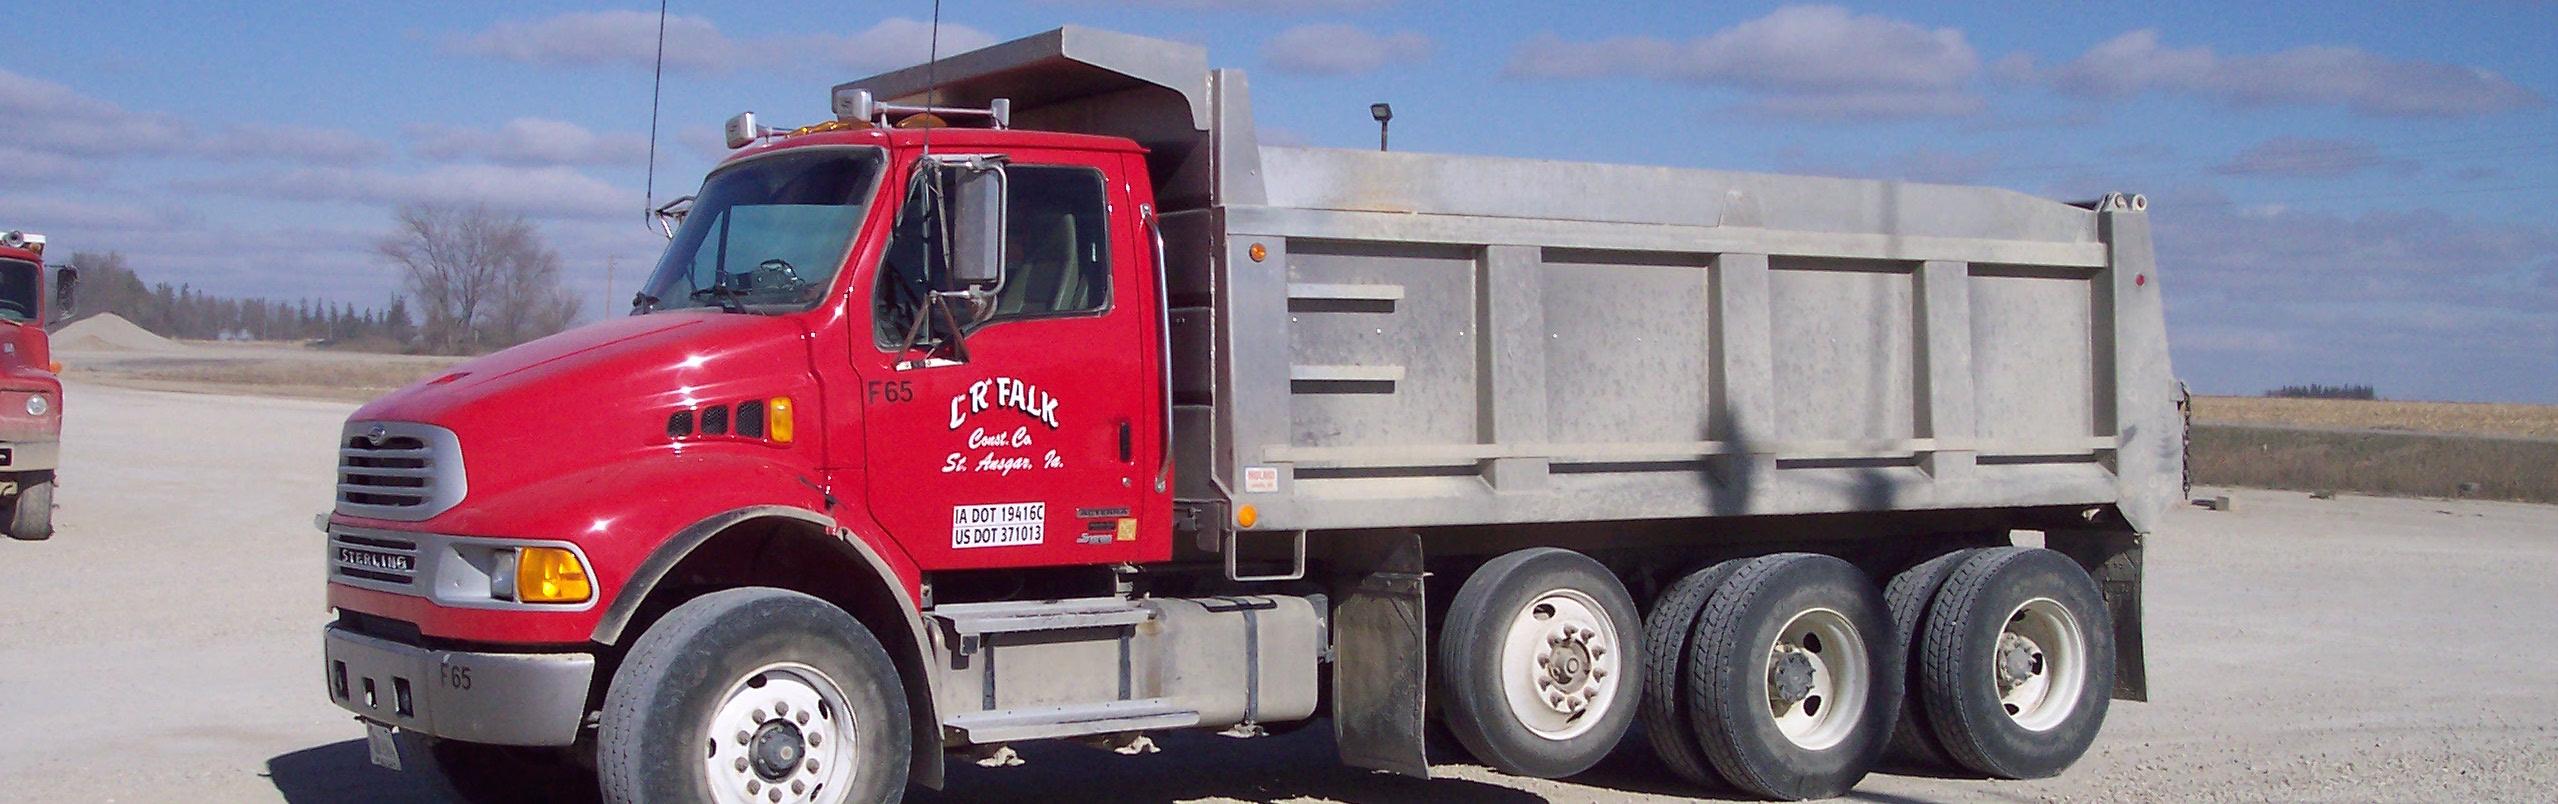 trucks-002